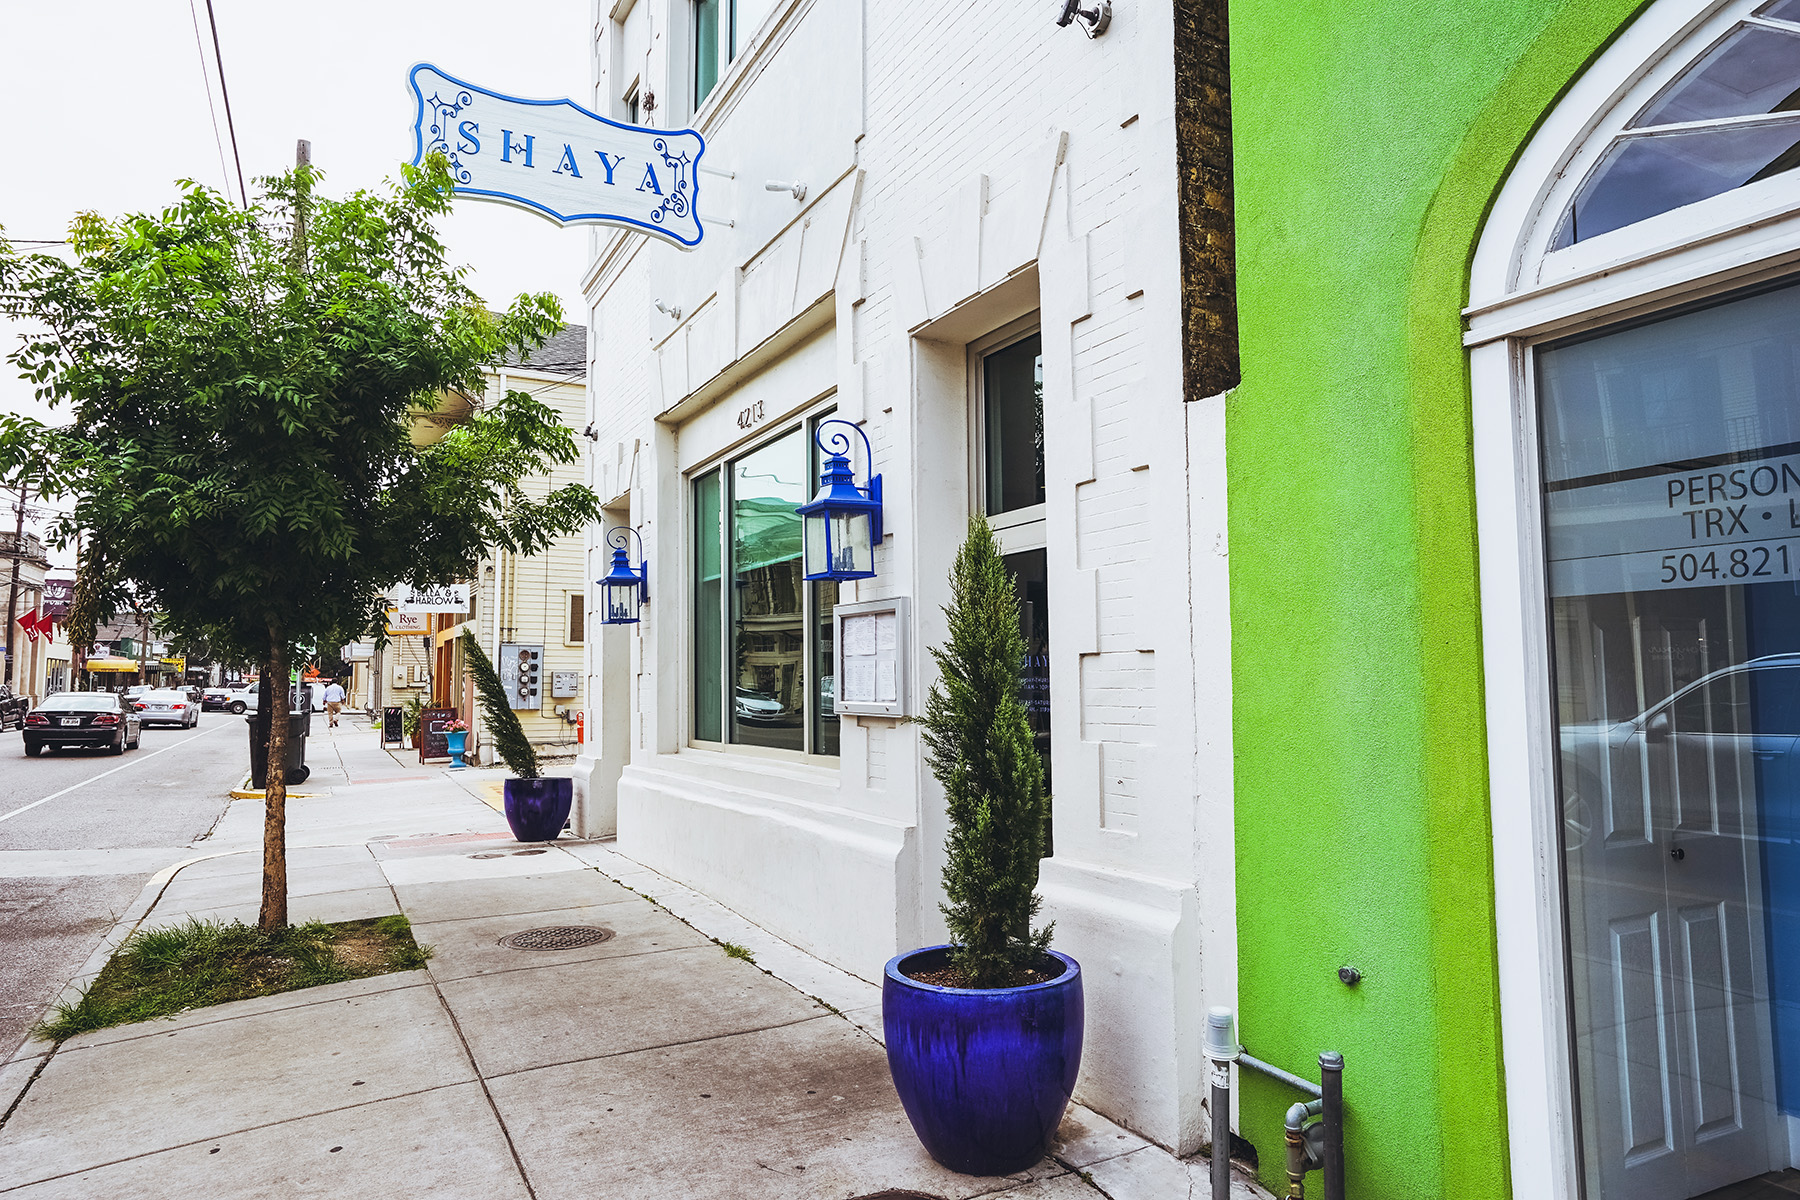 Shaya, where Chef Zachary Engel spends his days. (Photo by Paul Broussard)